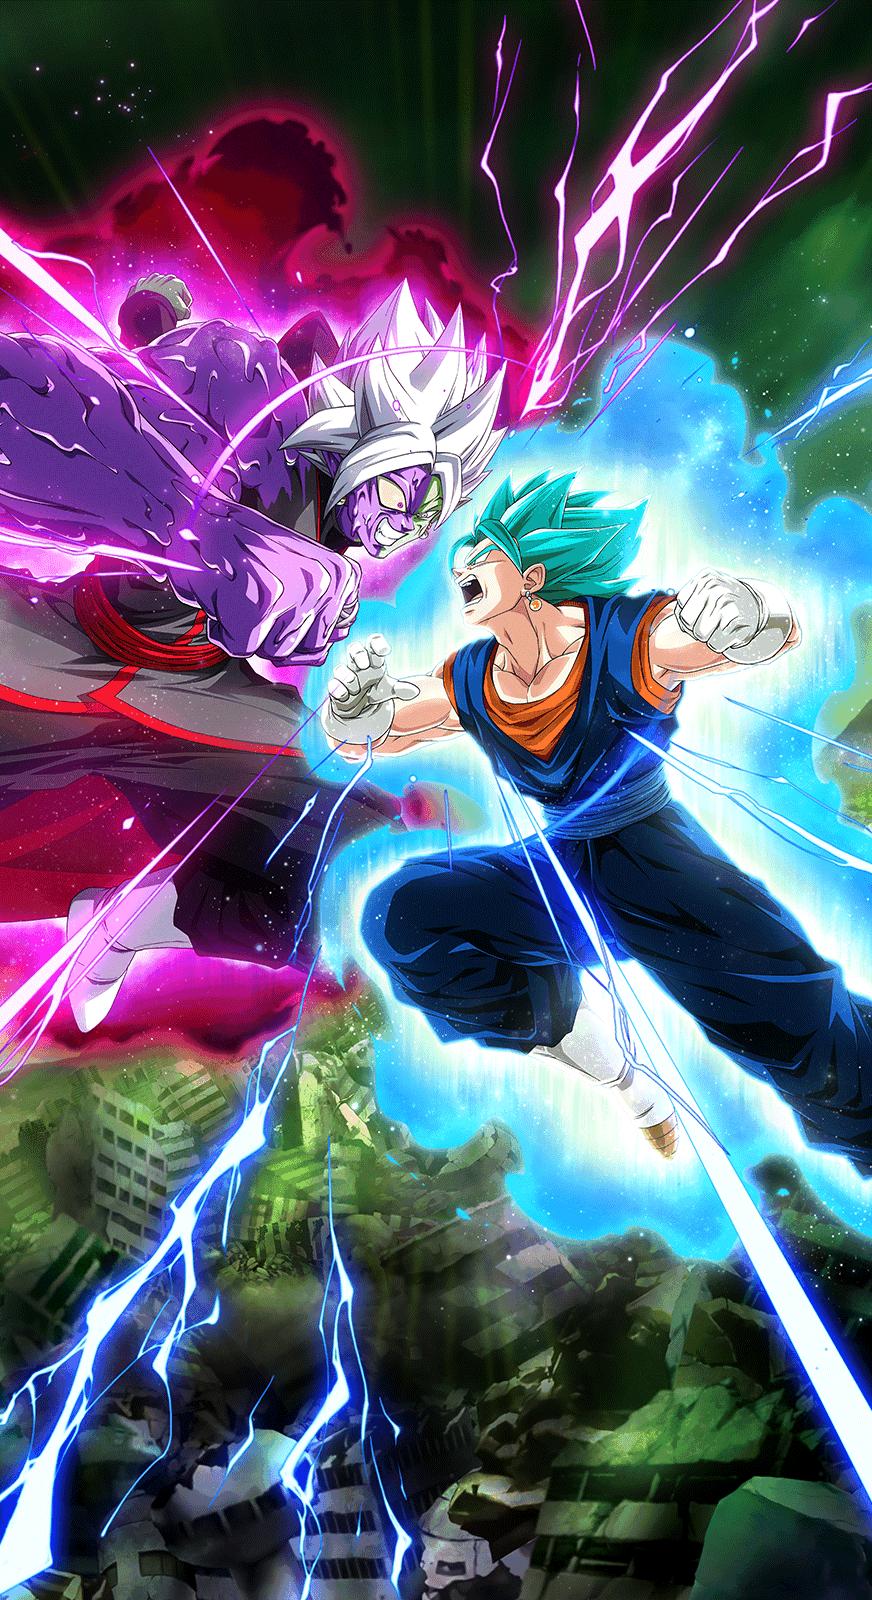 Vegito Ssgss Vs Zamasu Wallpaper Dokkan Battle By Maxiuchiha22 On Deviantart Anime Dragon Ball Super Dragon Ball Wallpapers Dragon Ball Wallpaper Iphone